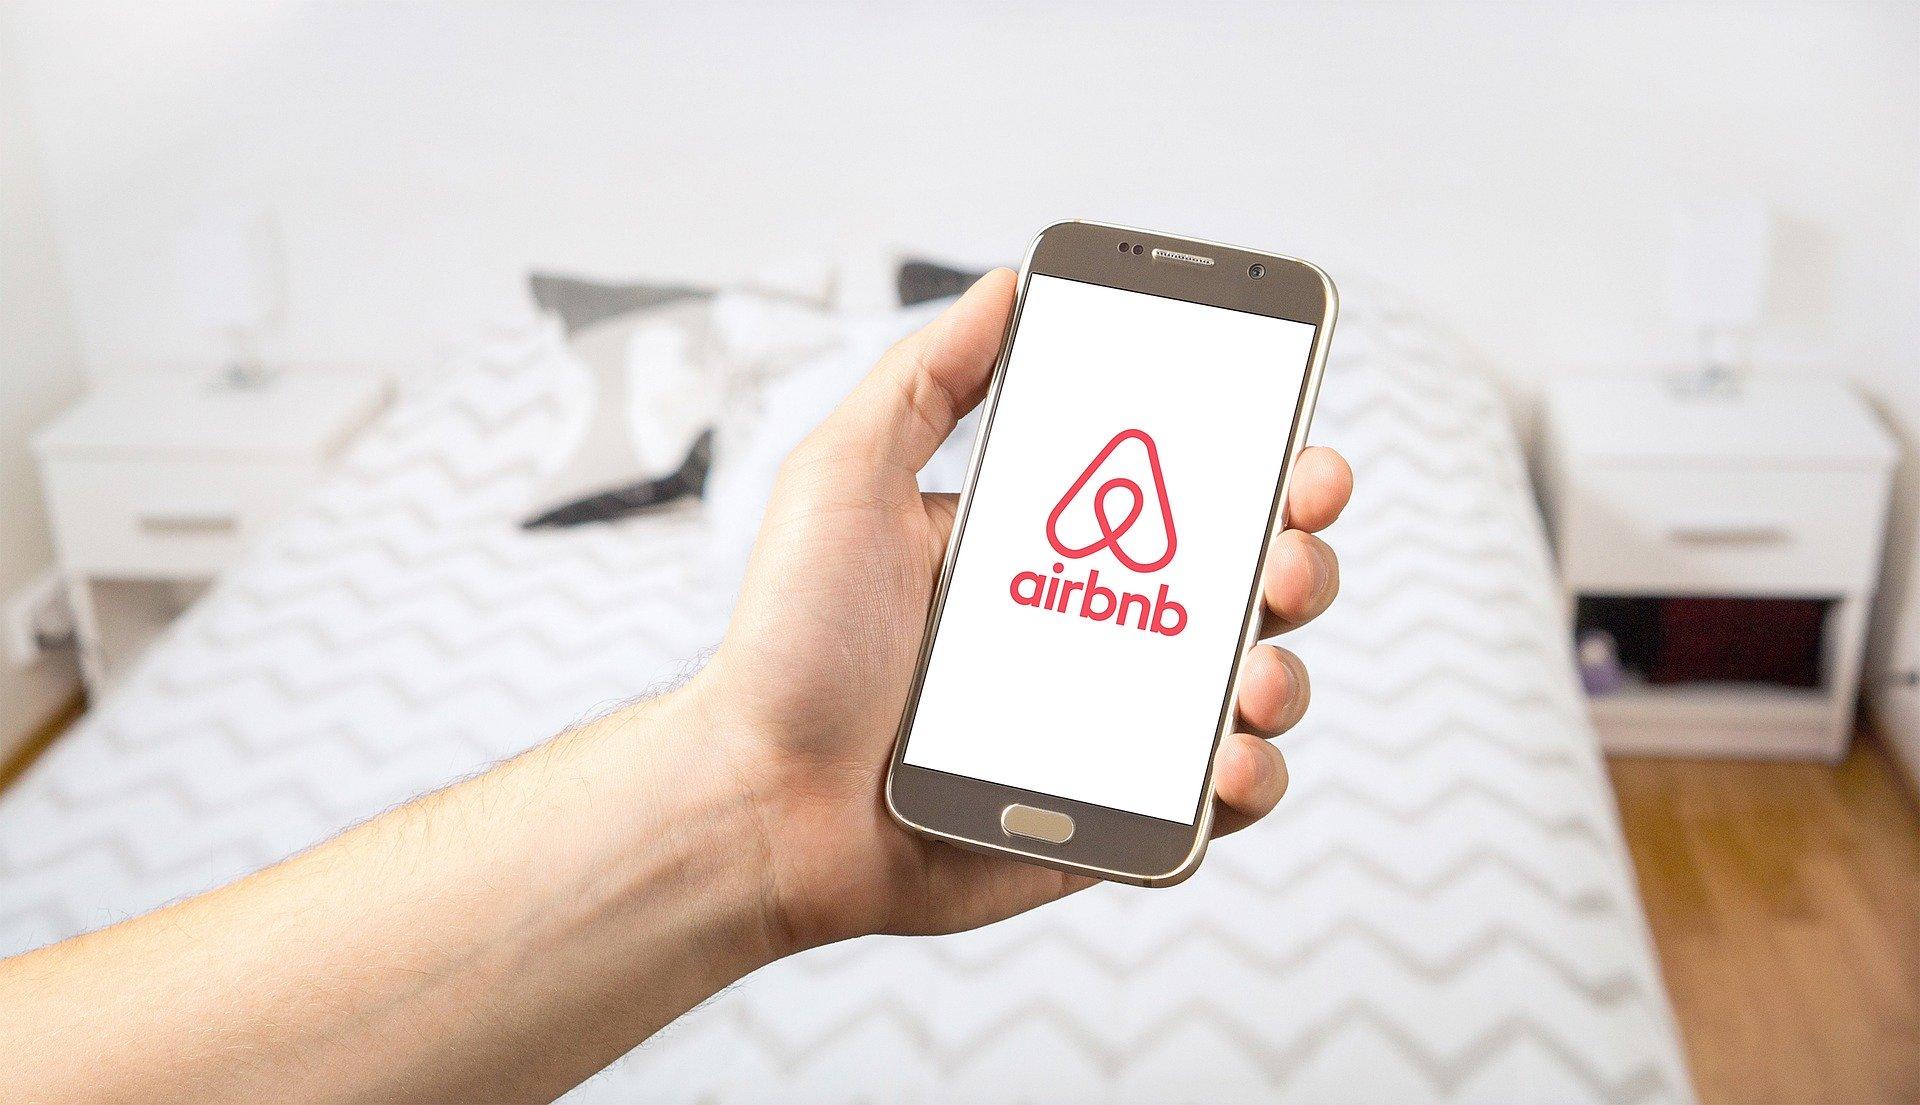 airbnb-smartphone